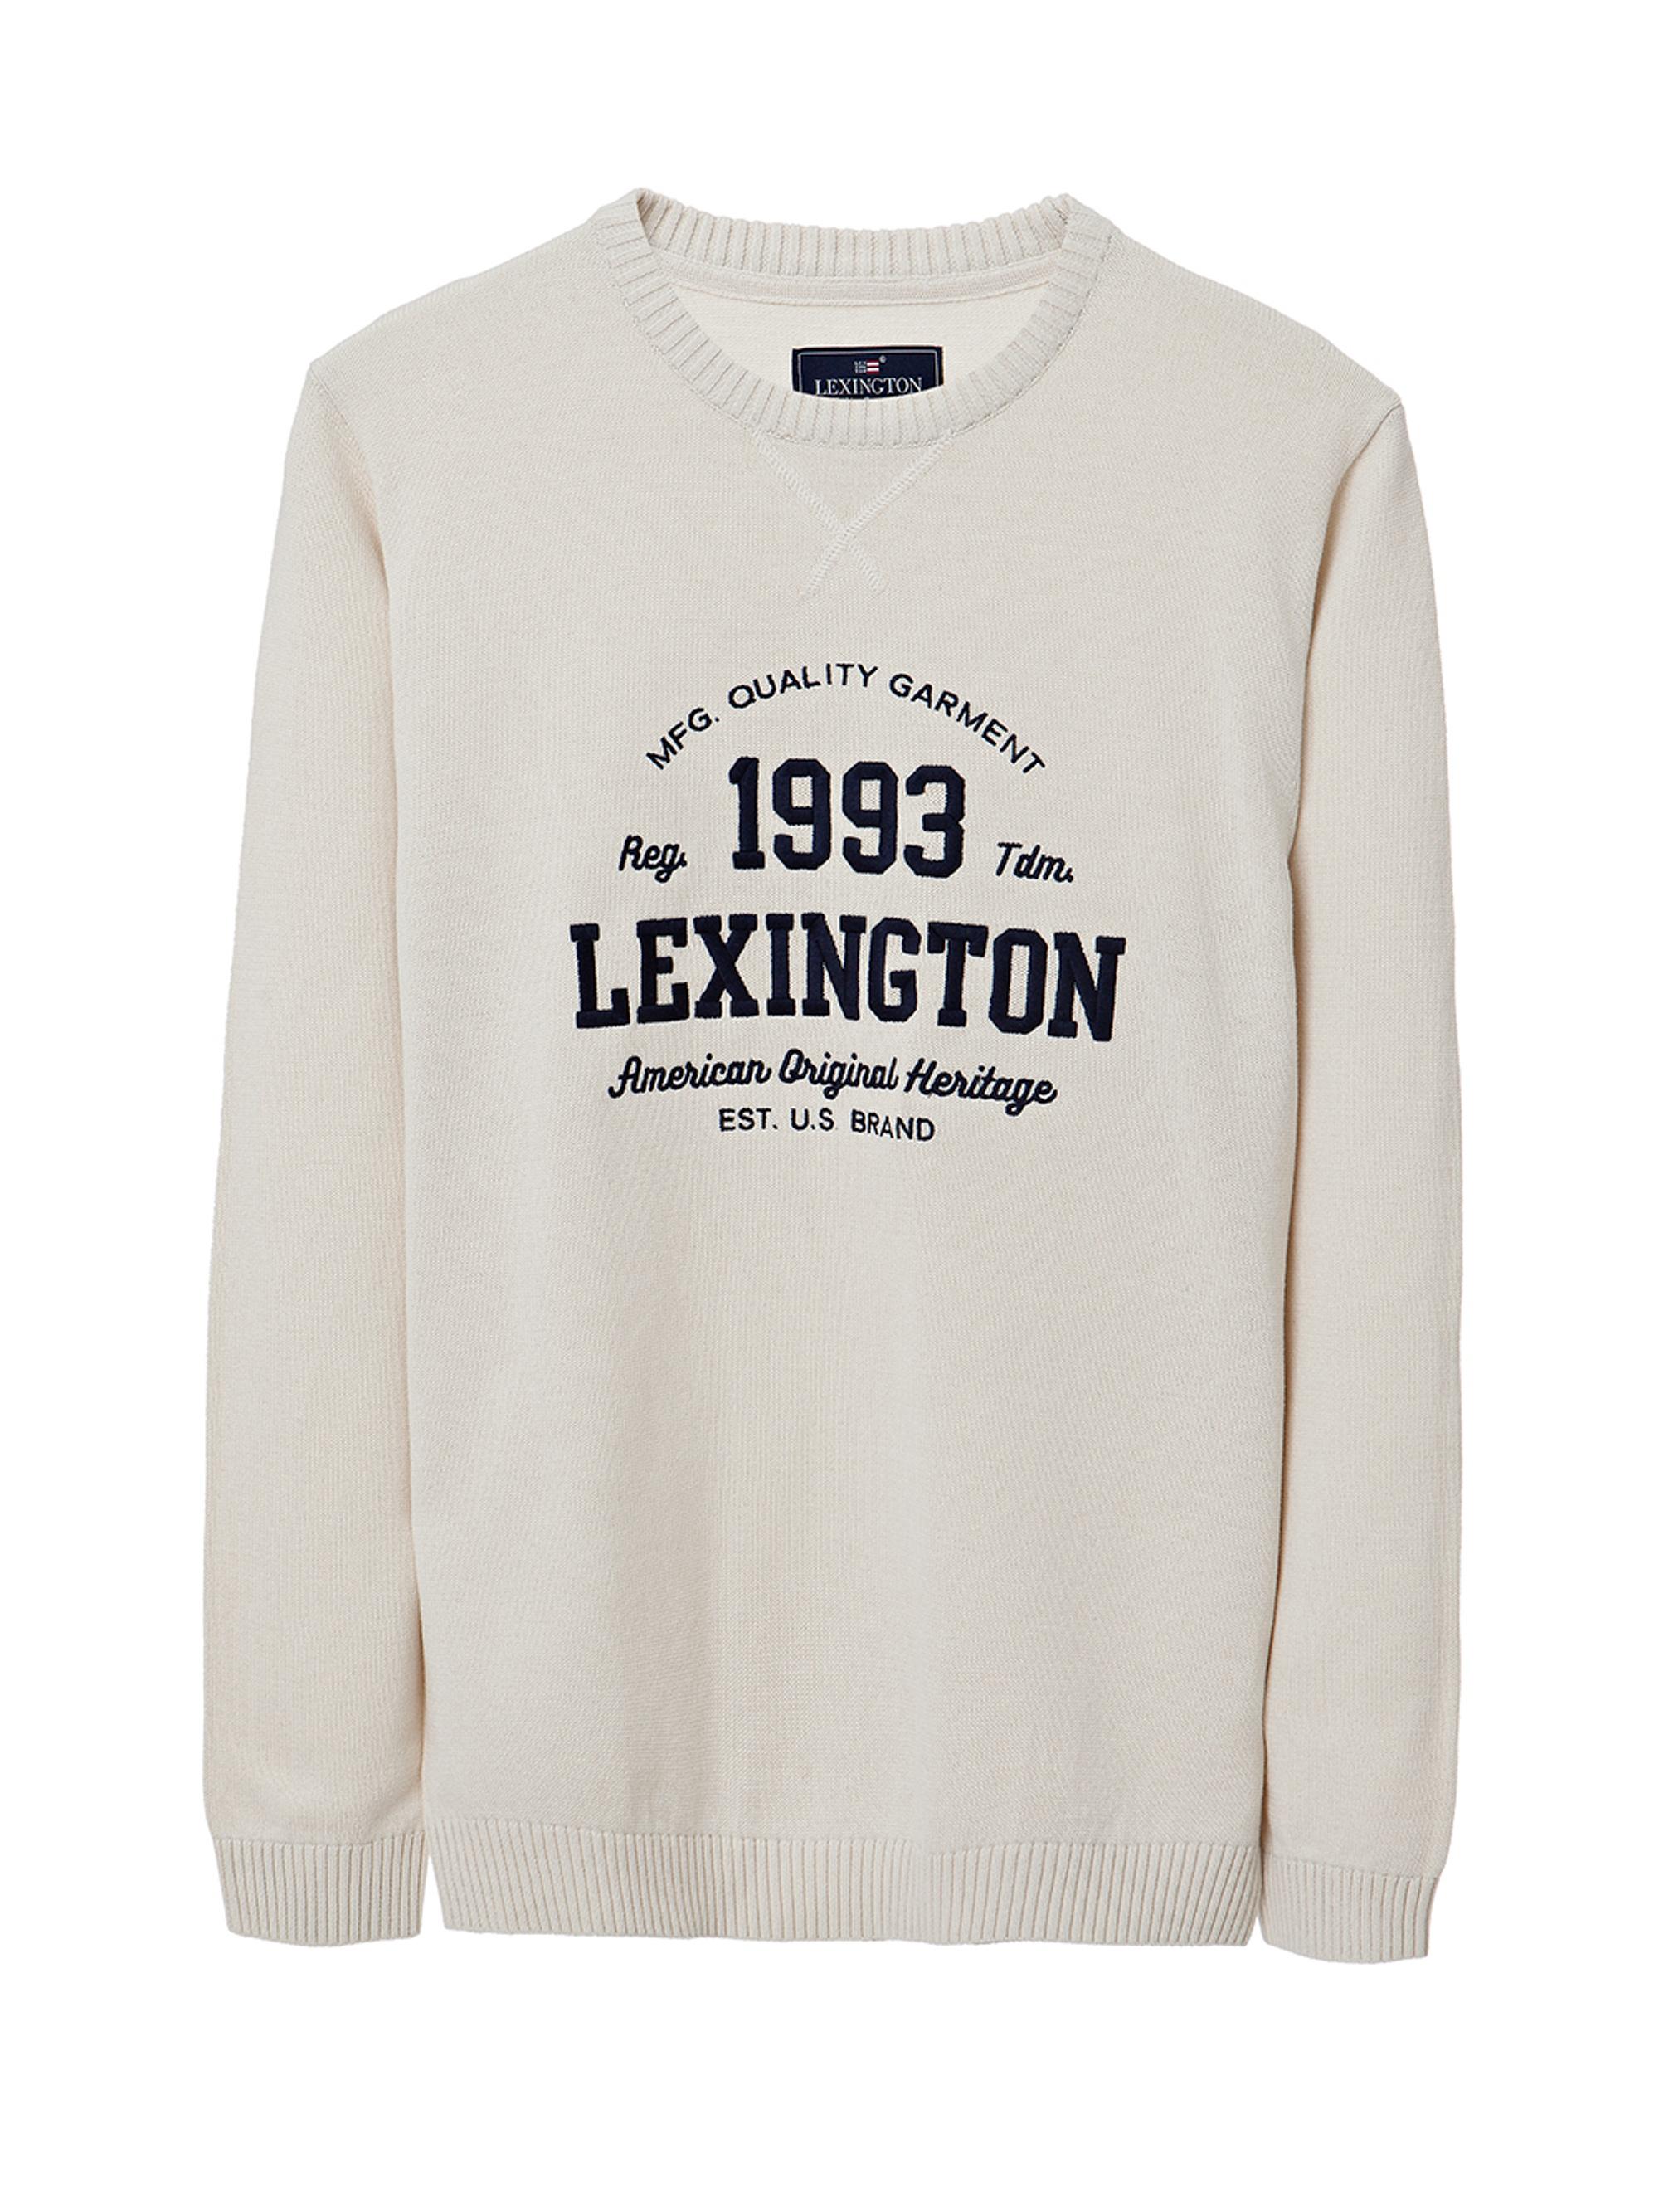 Nelson Knitted Sweatshirt, Shell White